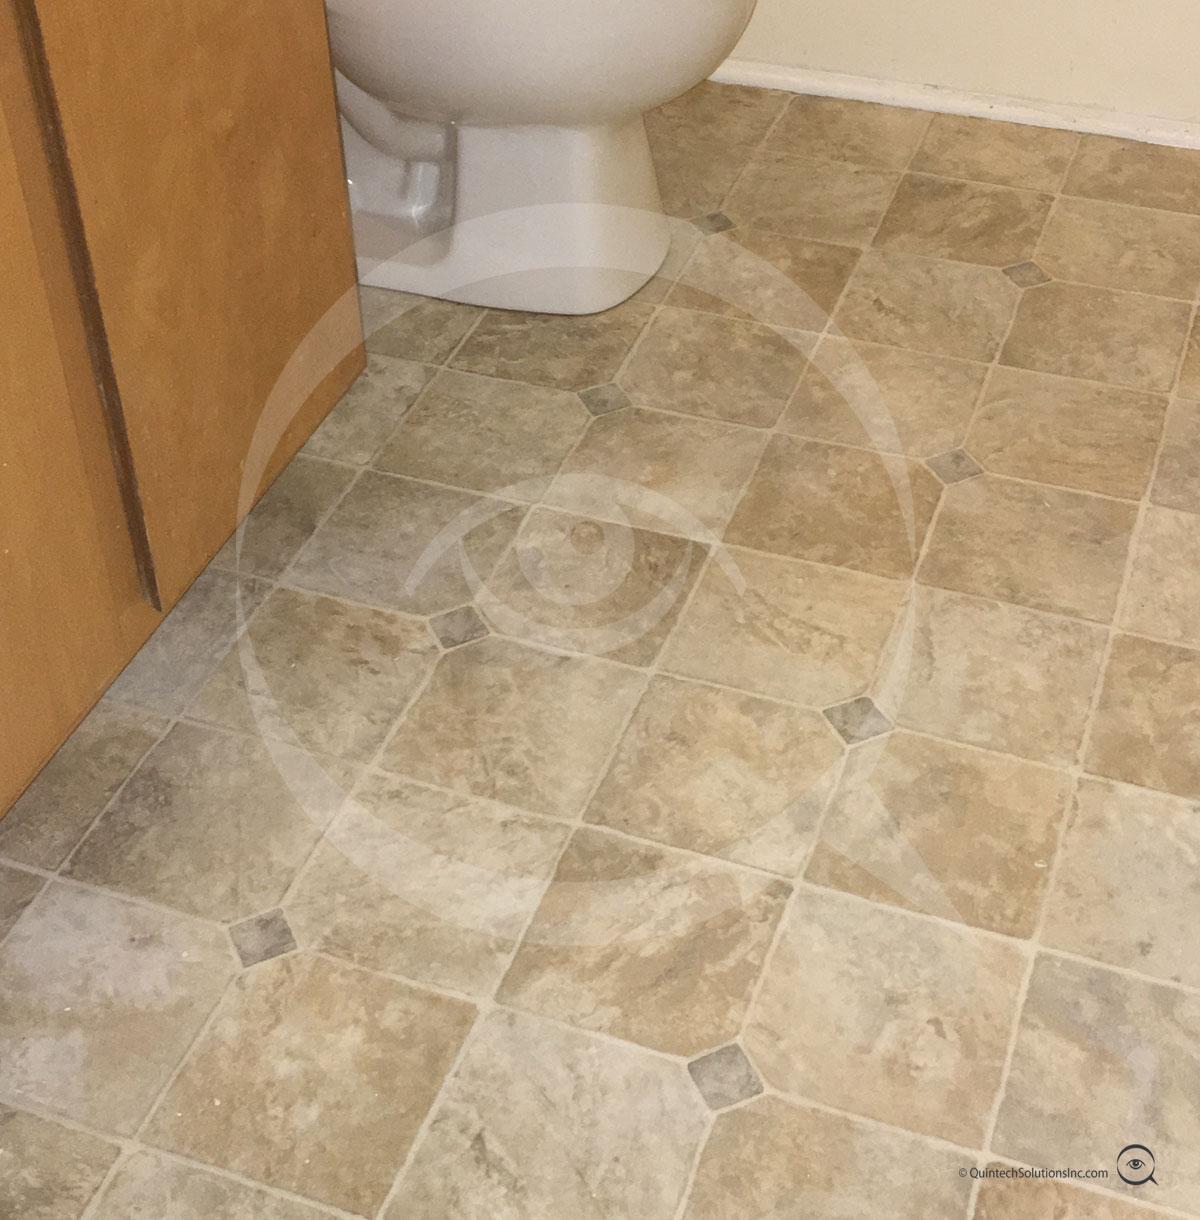 replacing bathroom carpet replacing carpet with tile in bathroom carpet vidalondon. Black Bedroom Furniture Sets. Home Design Ideas